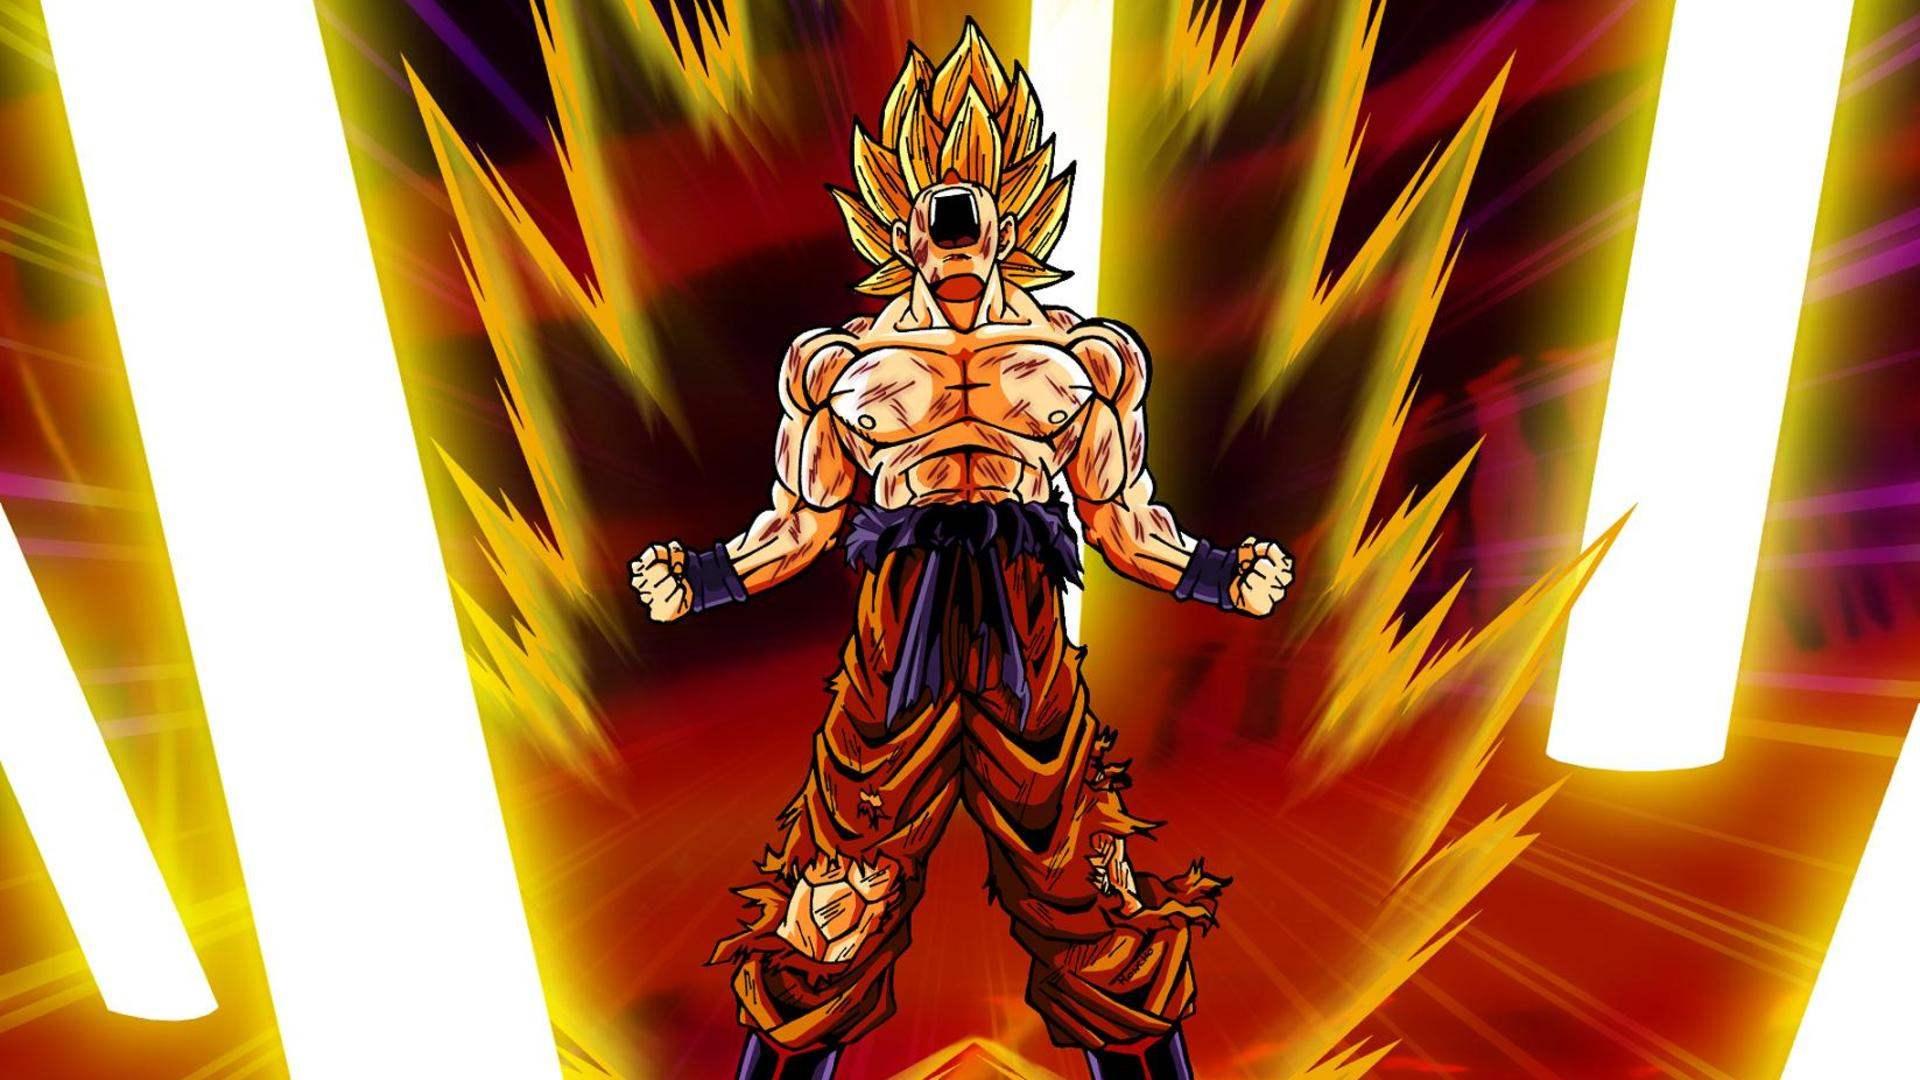 Dragon Ball Z Goku Super Saiyan 183 Hd Wallpapers in Cartoons 1920x1080